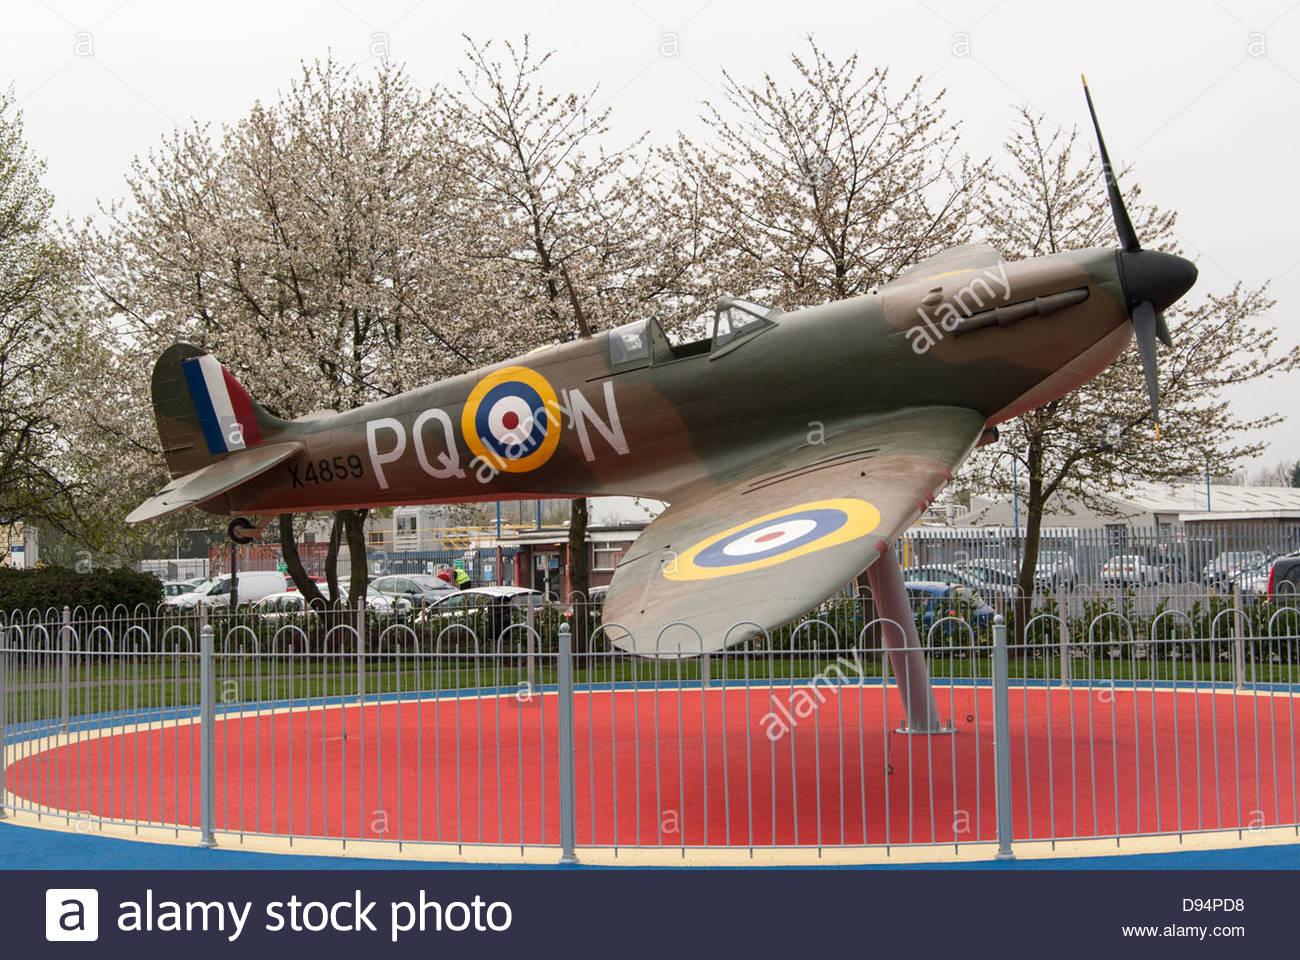 Replica of Spitfire PQ-N built as a Memorial to the Fallen of RAF Grangemouth  WW2. - Stock Image